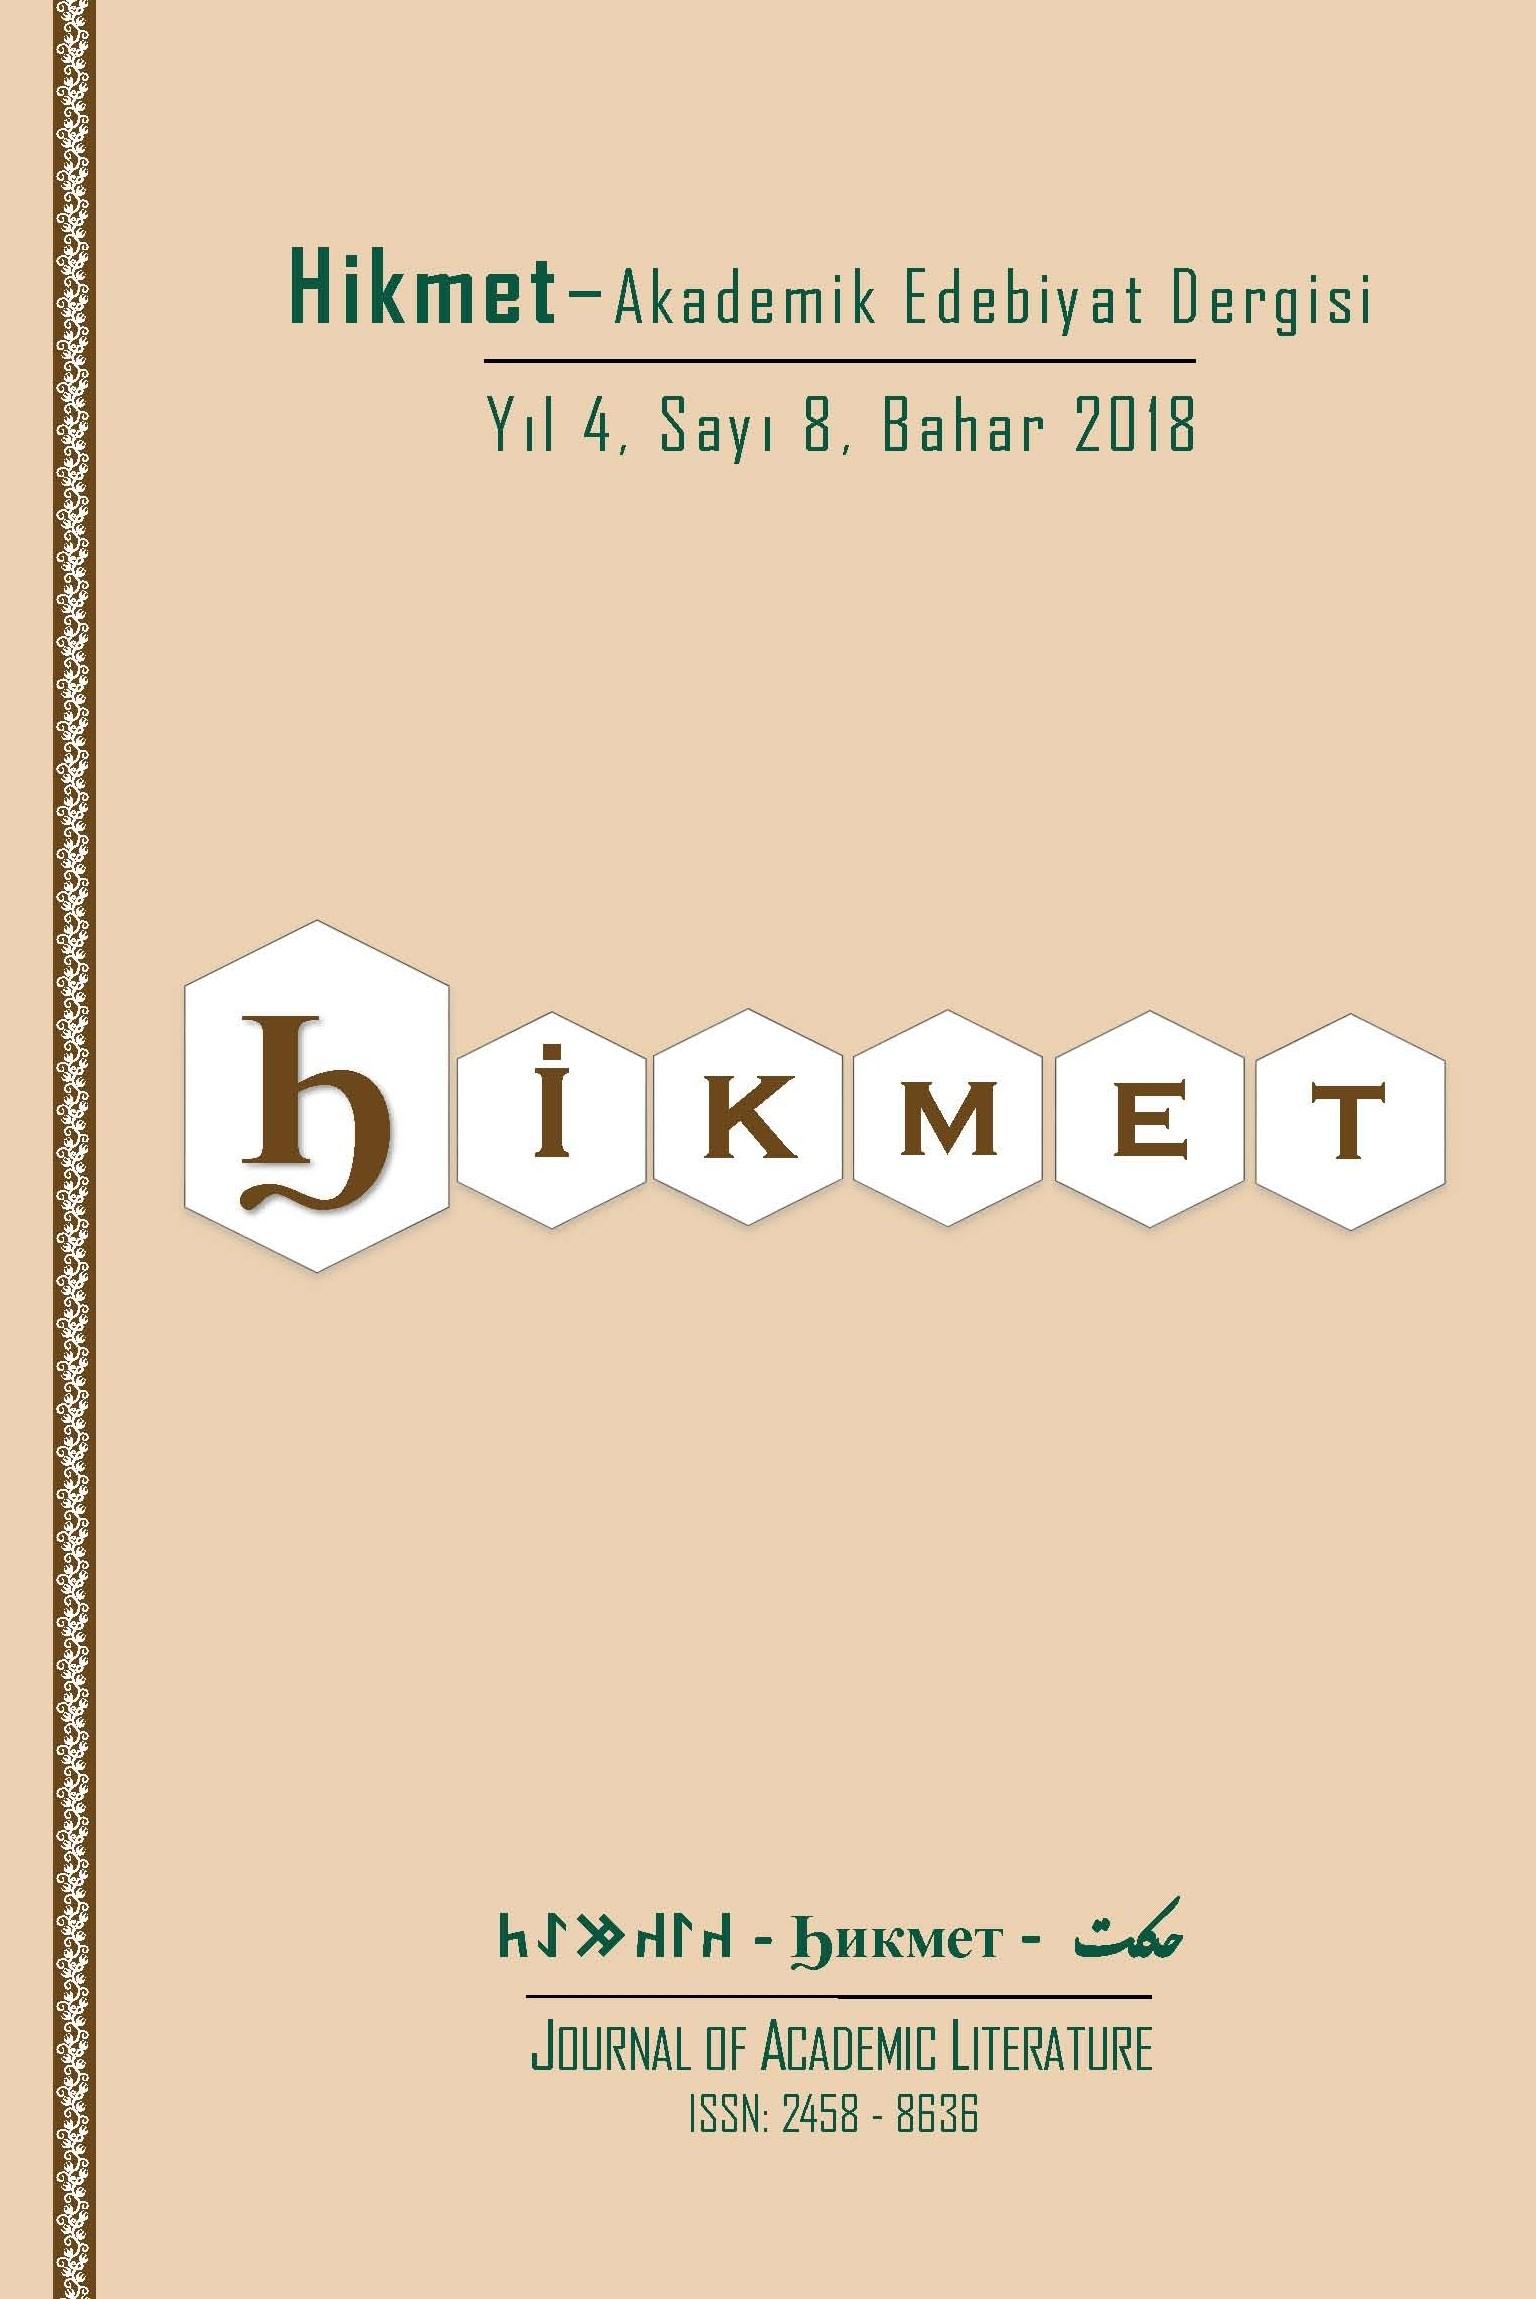 Hikmet-akademik edebiyat dergisi (Online)